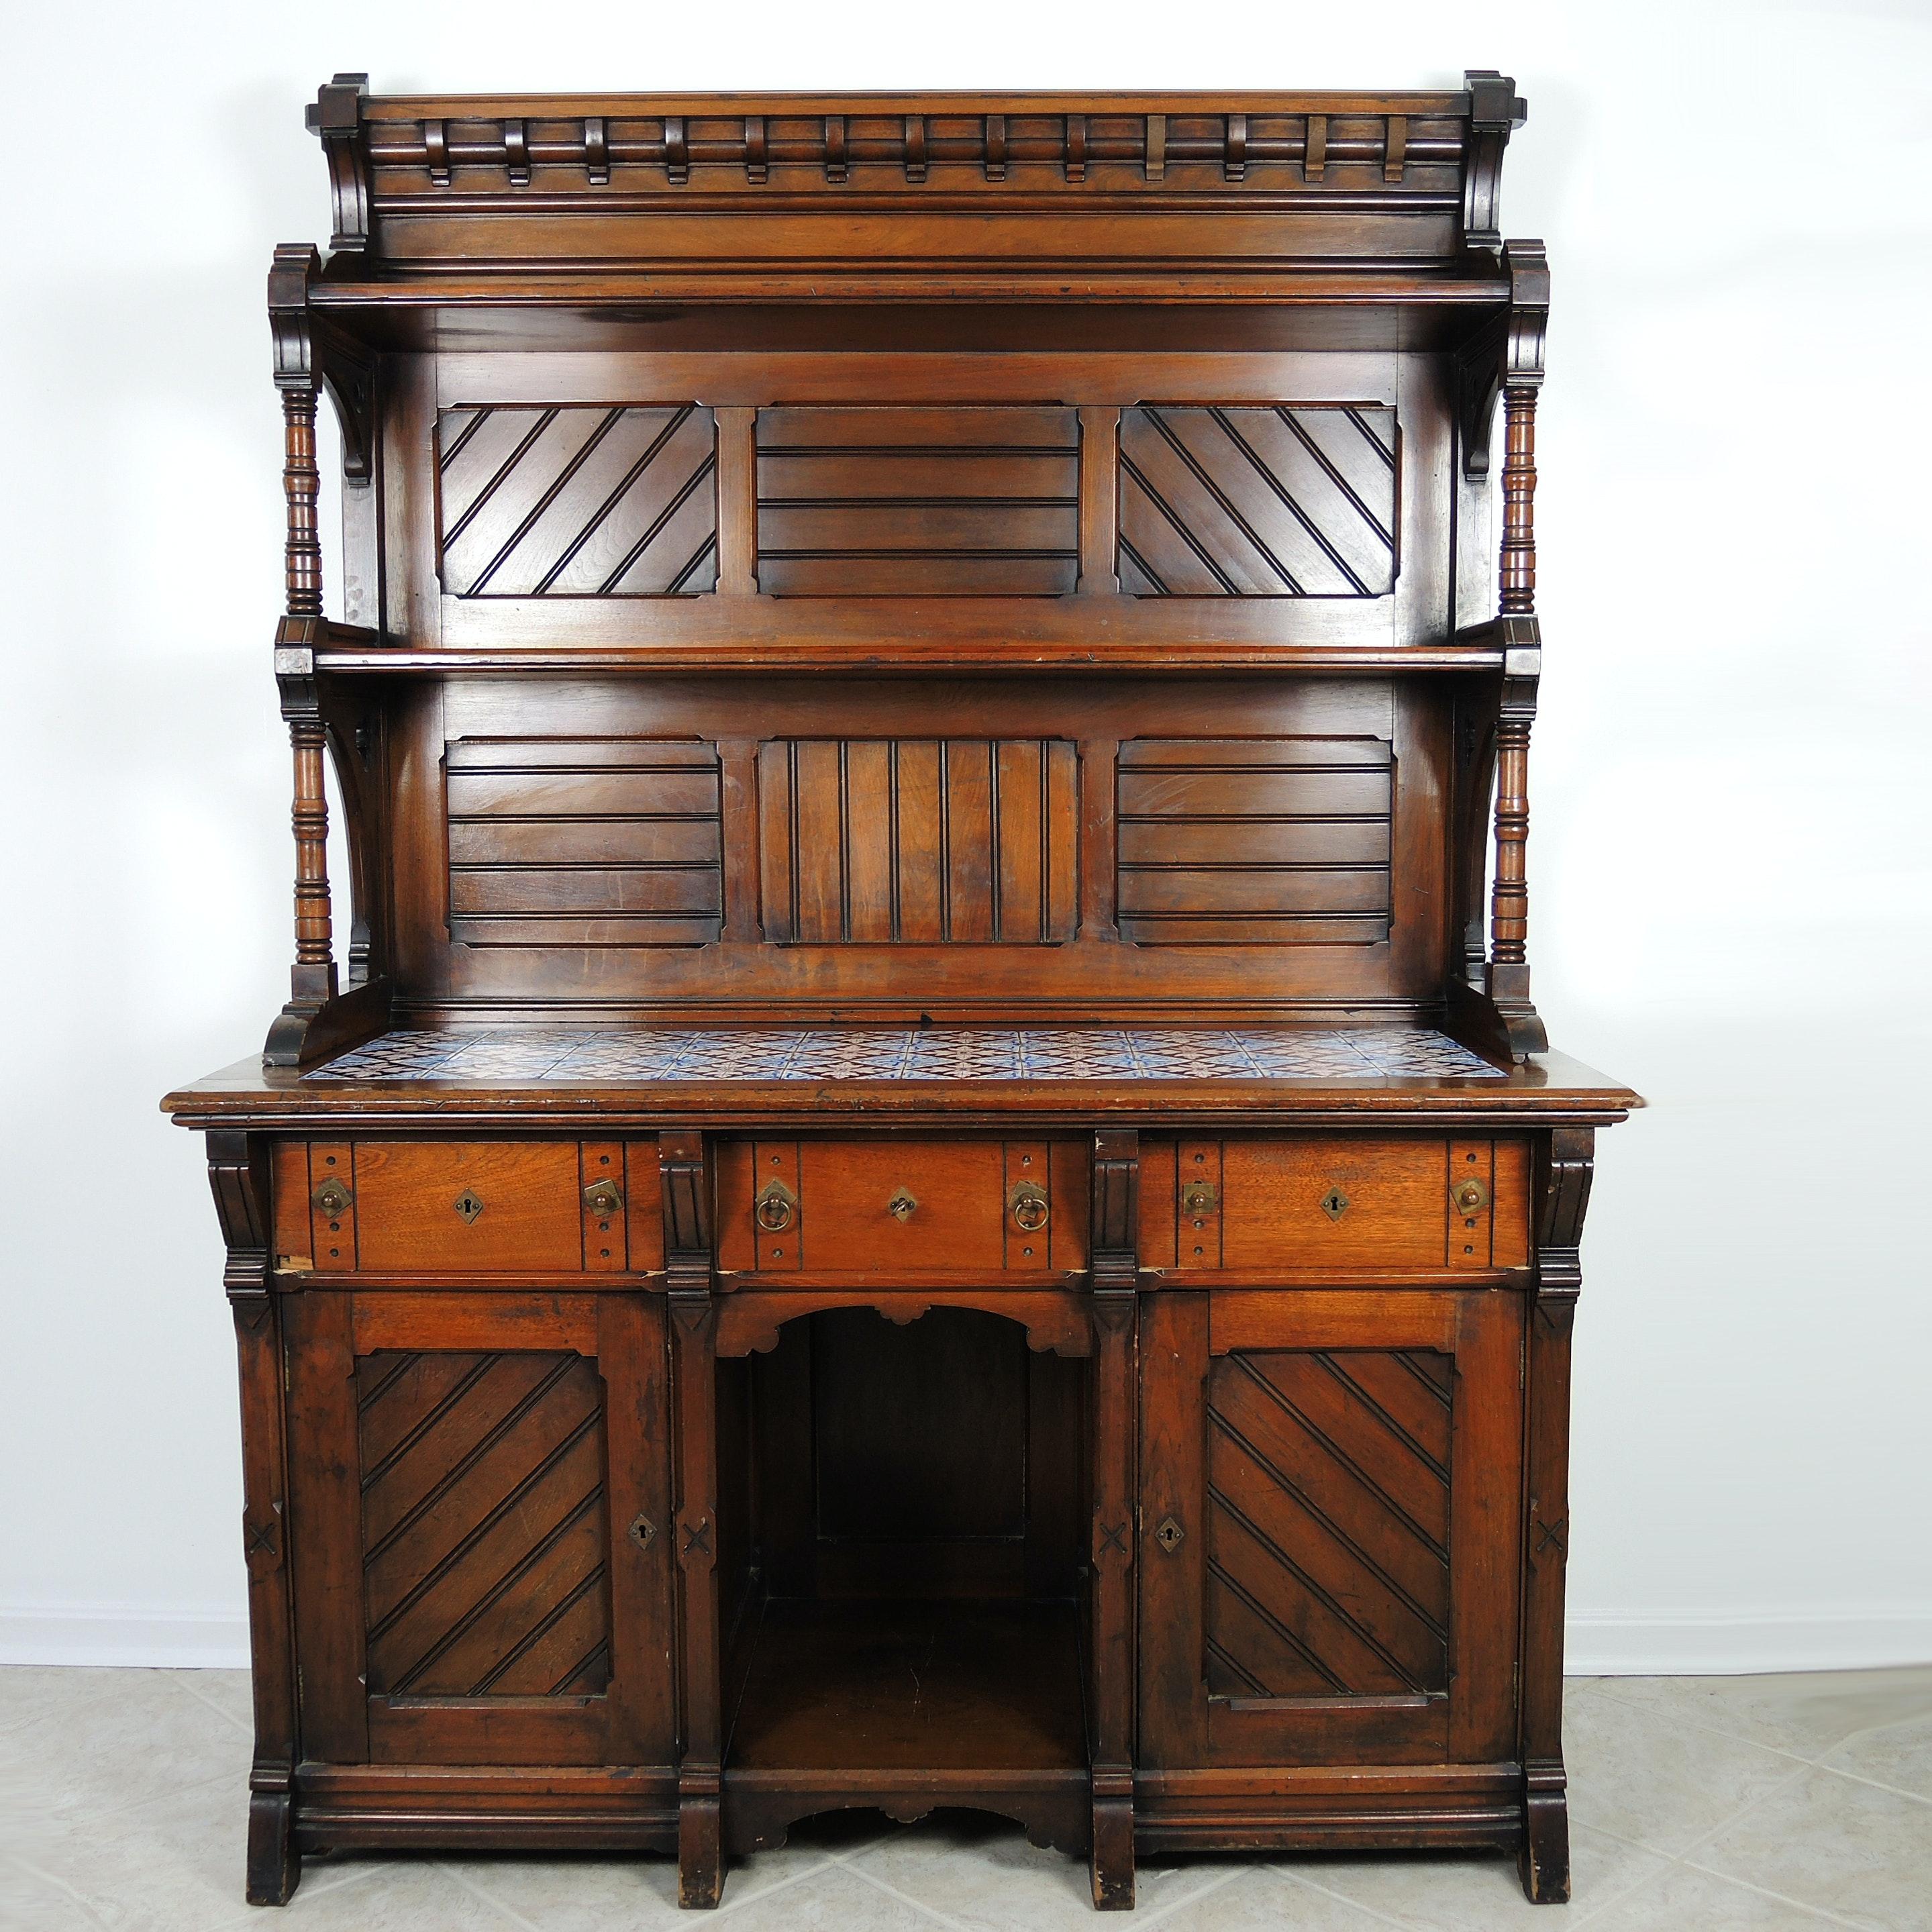 Late 19th Century Eastlake Tile Top Sideboard Cabinet in Walnut